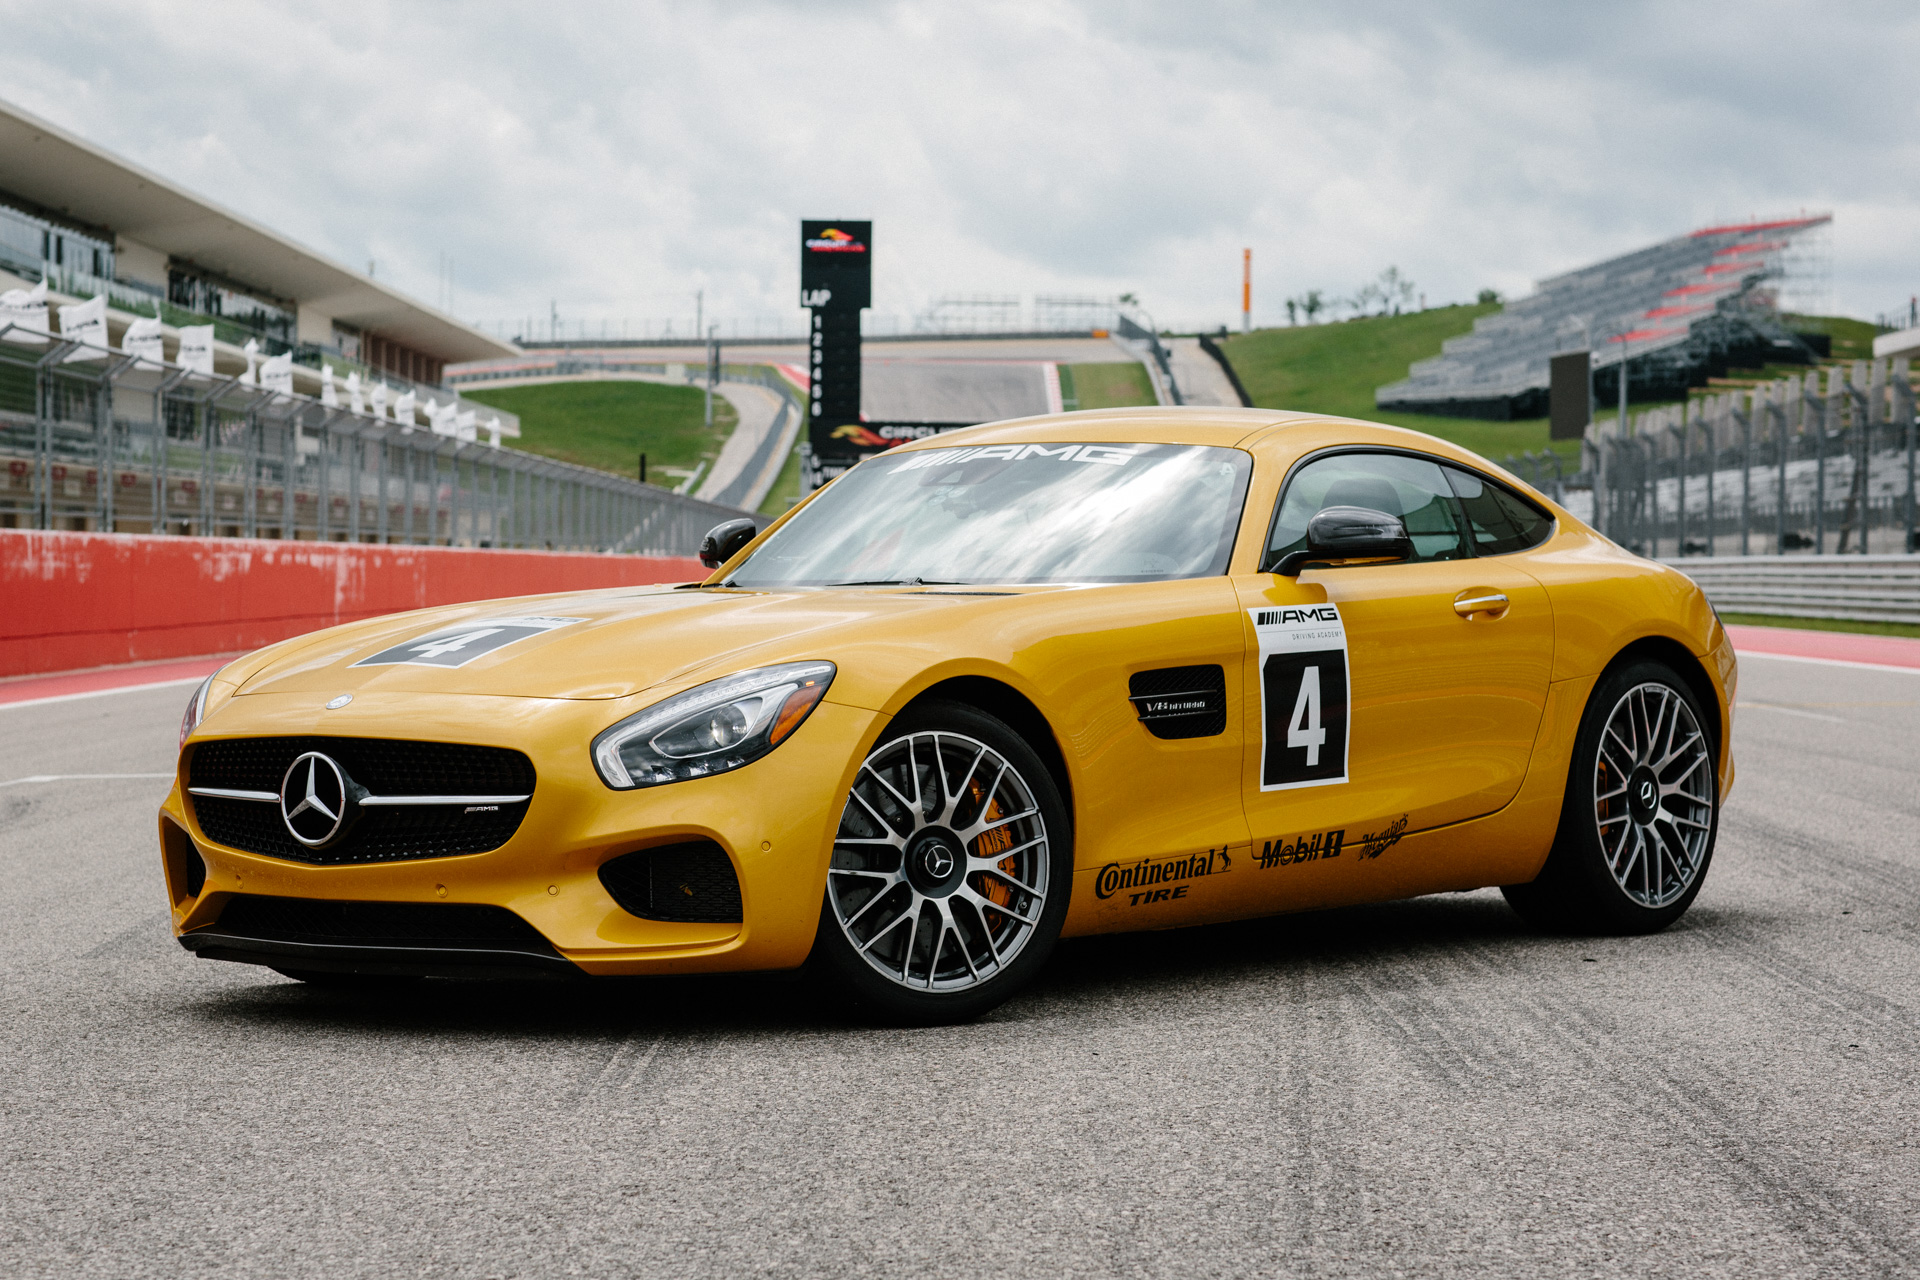 Mercedes_Benz_AMG_2017_Edits (4 of 23).jpg